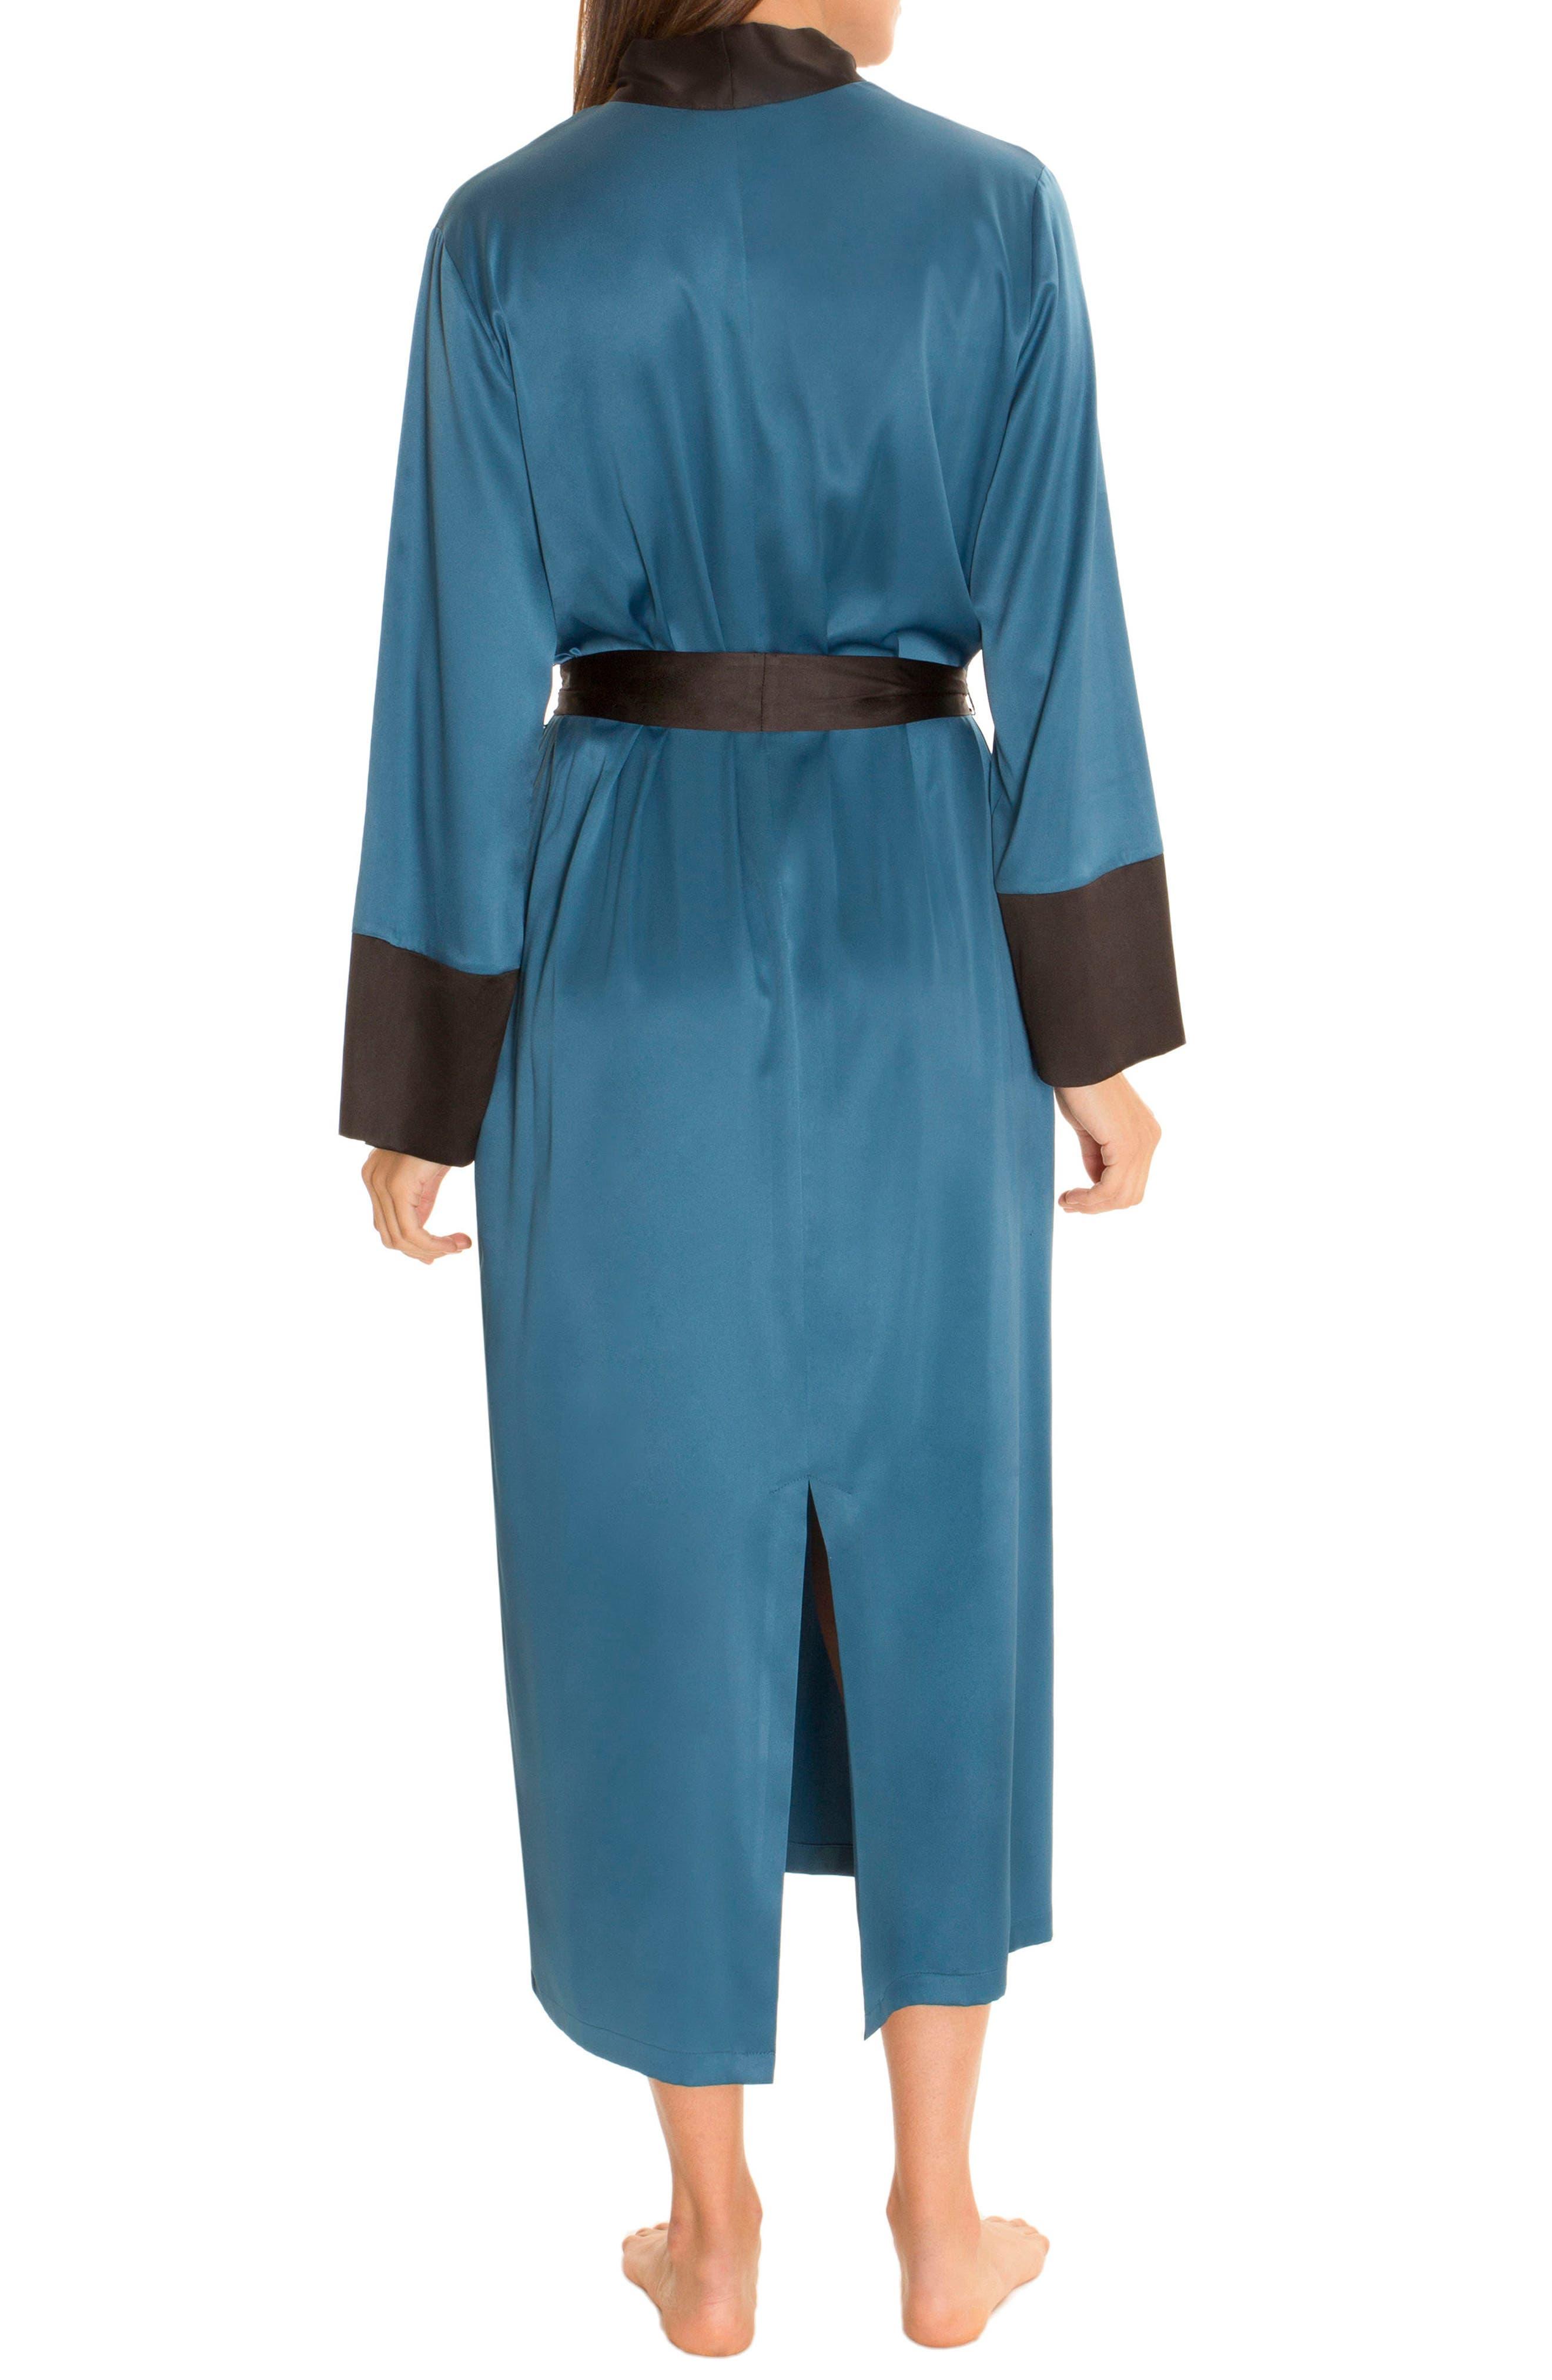 Kimono Robe,                             Alternate thumbnail 2, color,                             440